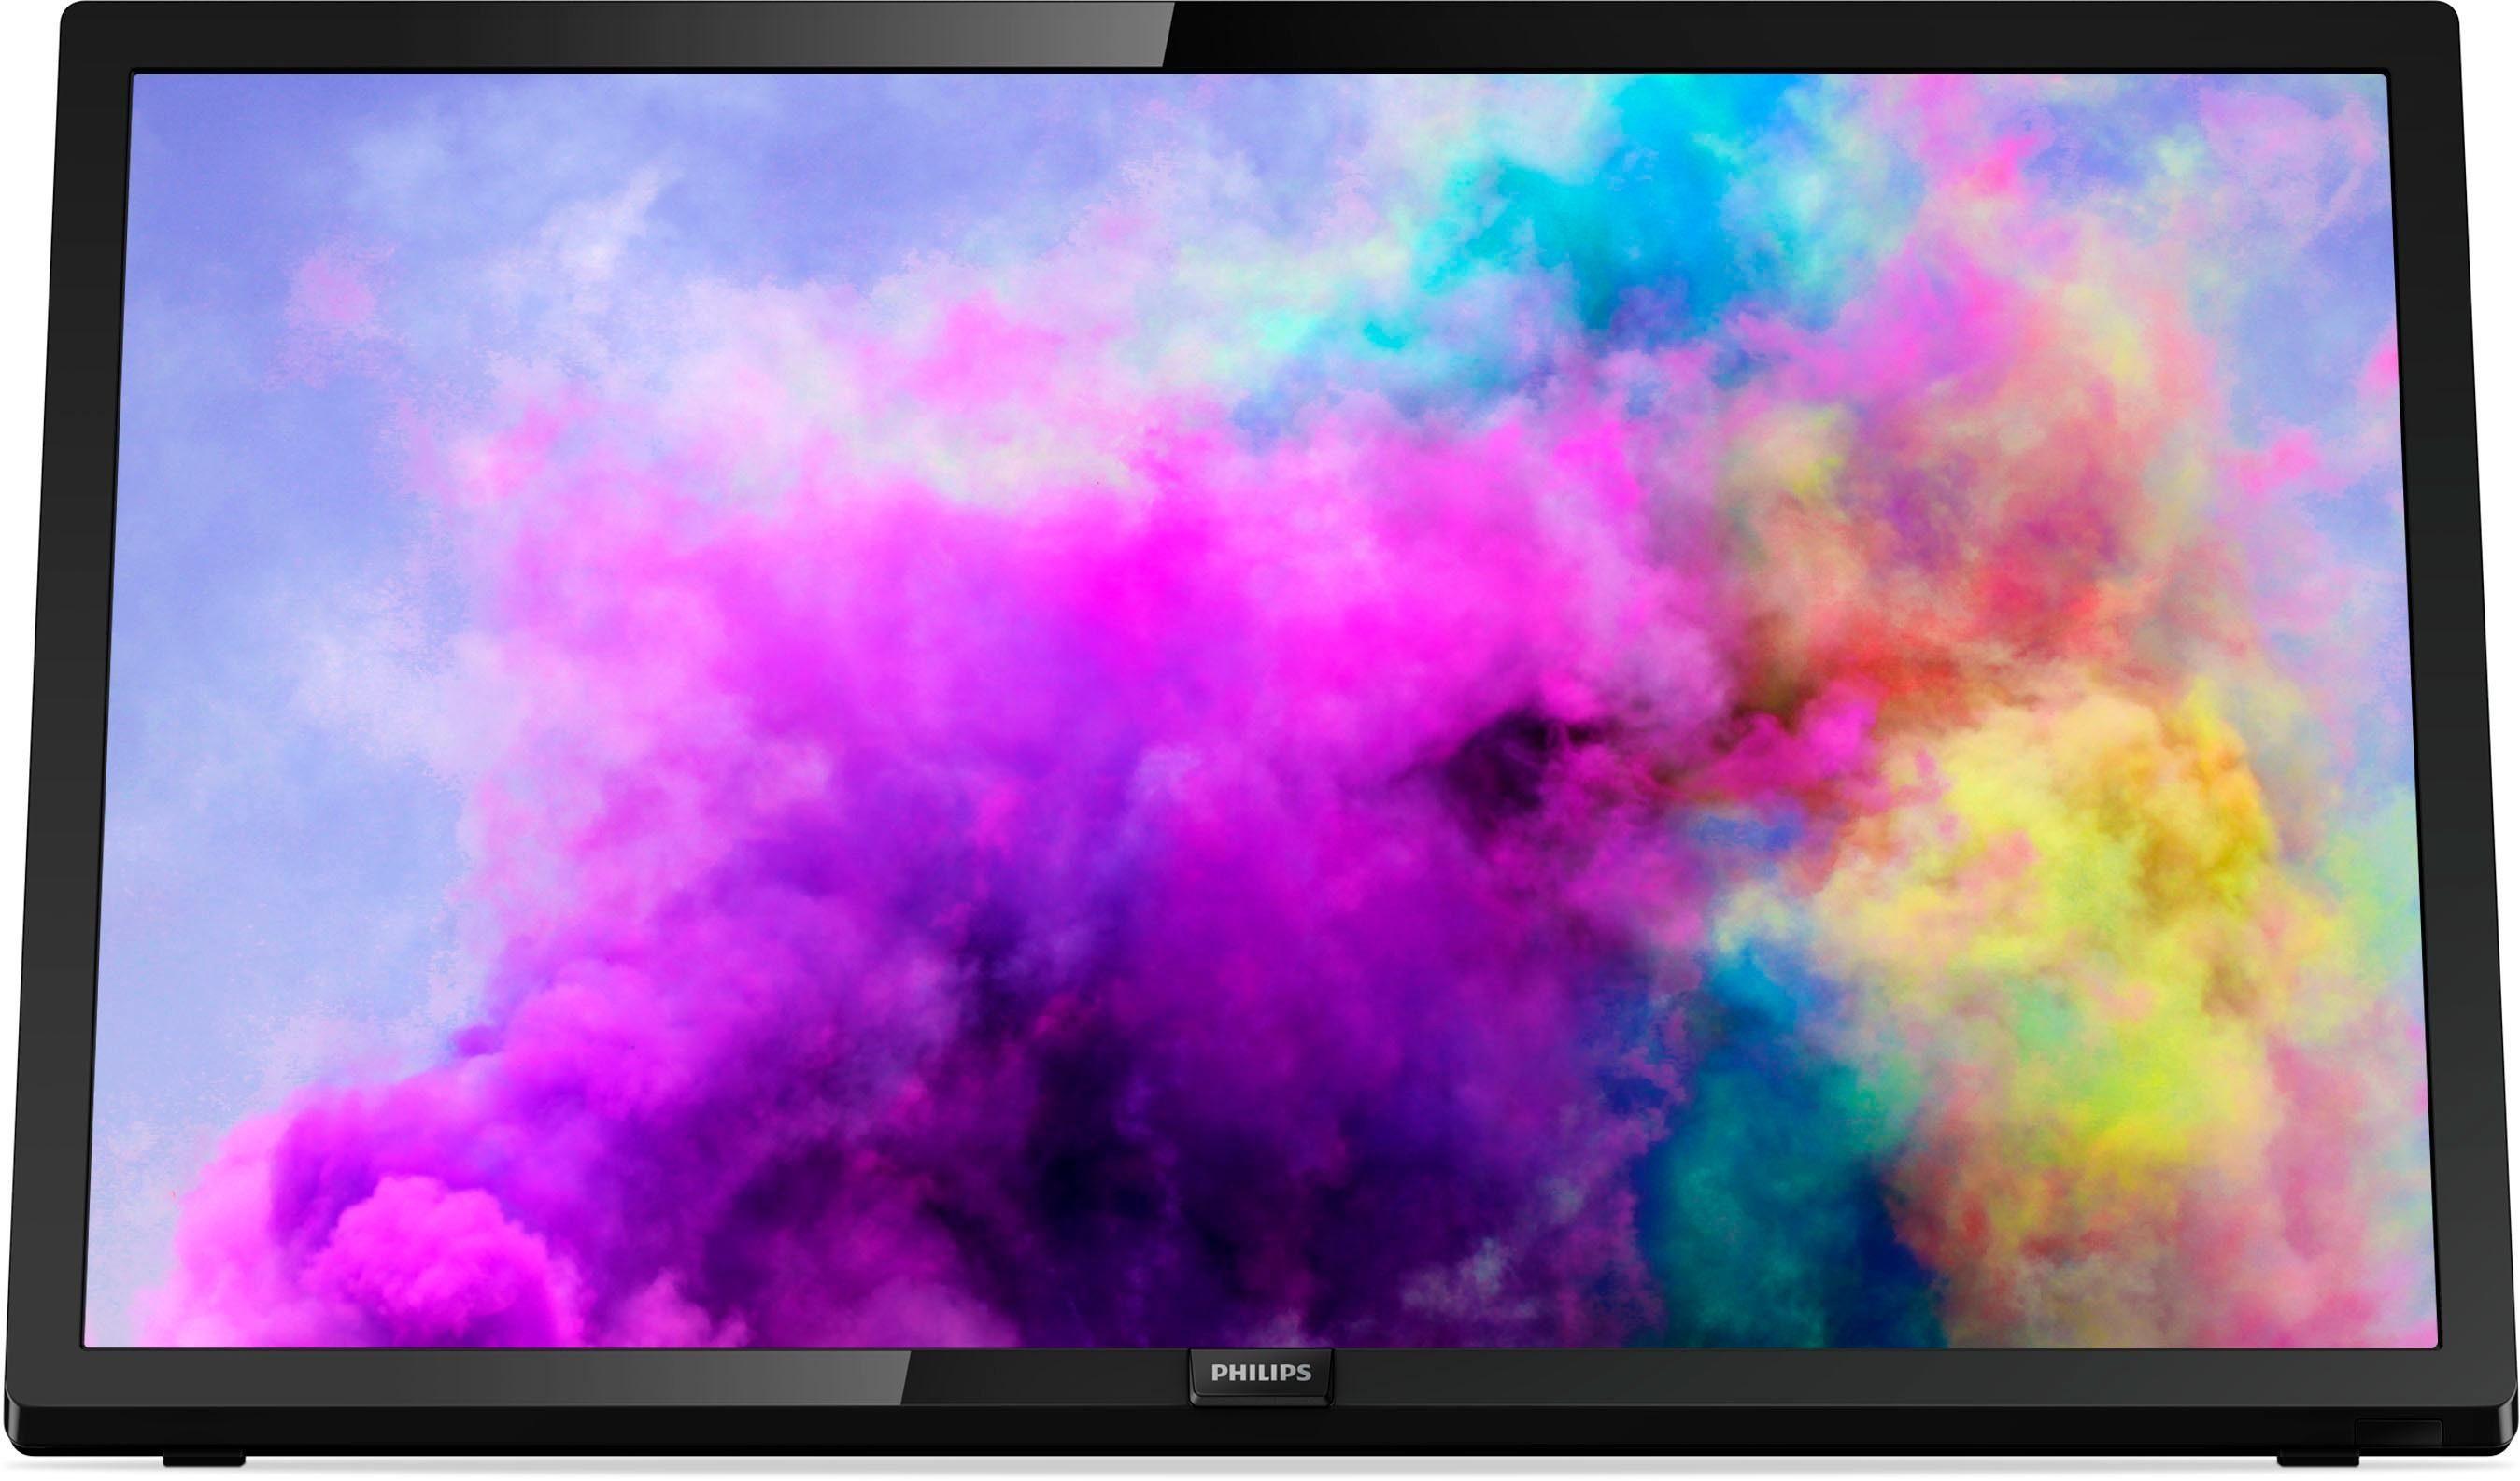 Philips 24PFS5303/12 LED-Fernseher (24 Zoll, Full HD)